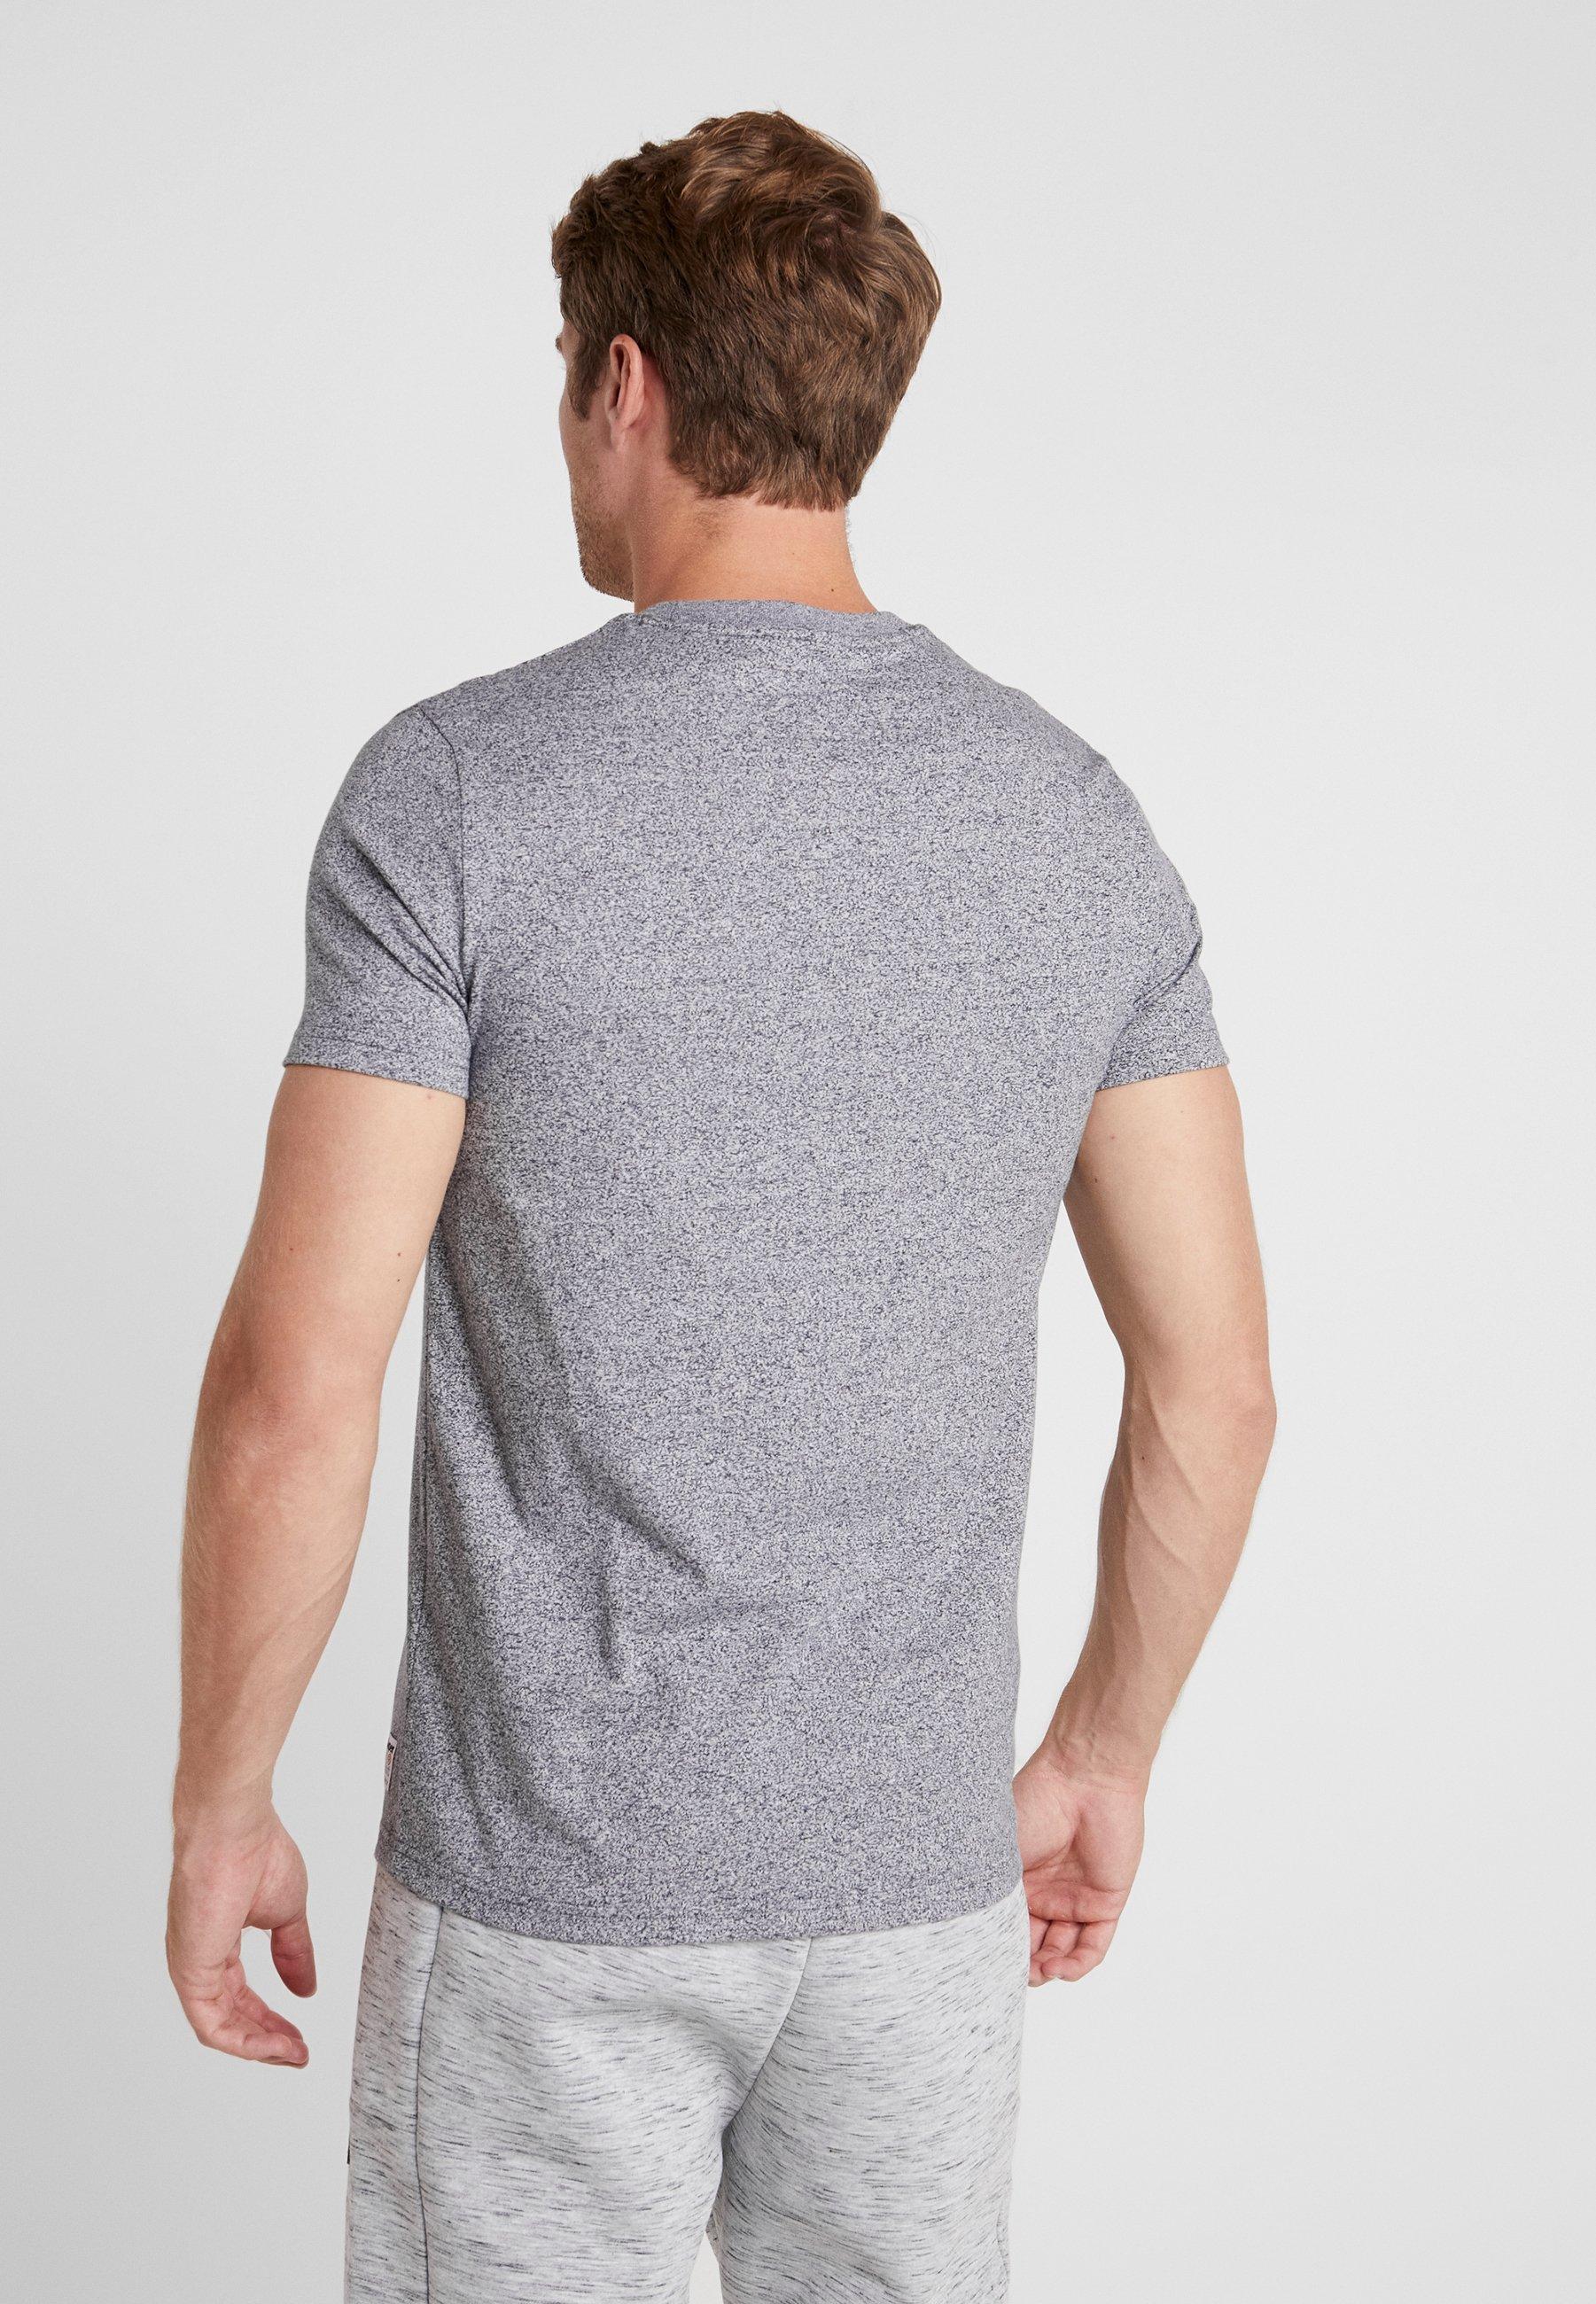 Stampa Superdry Box Con Grit Grey Speed shirt TeeT rtCdsQh